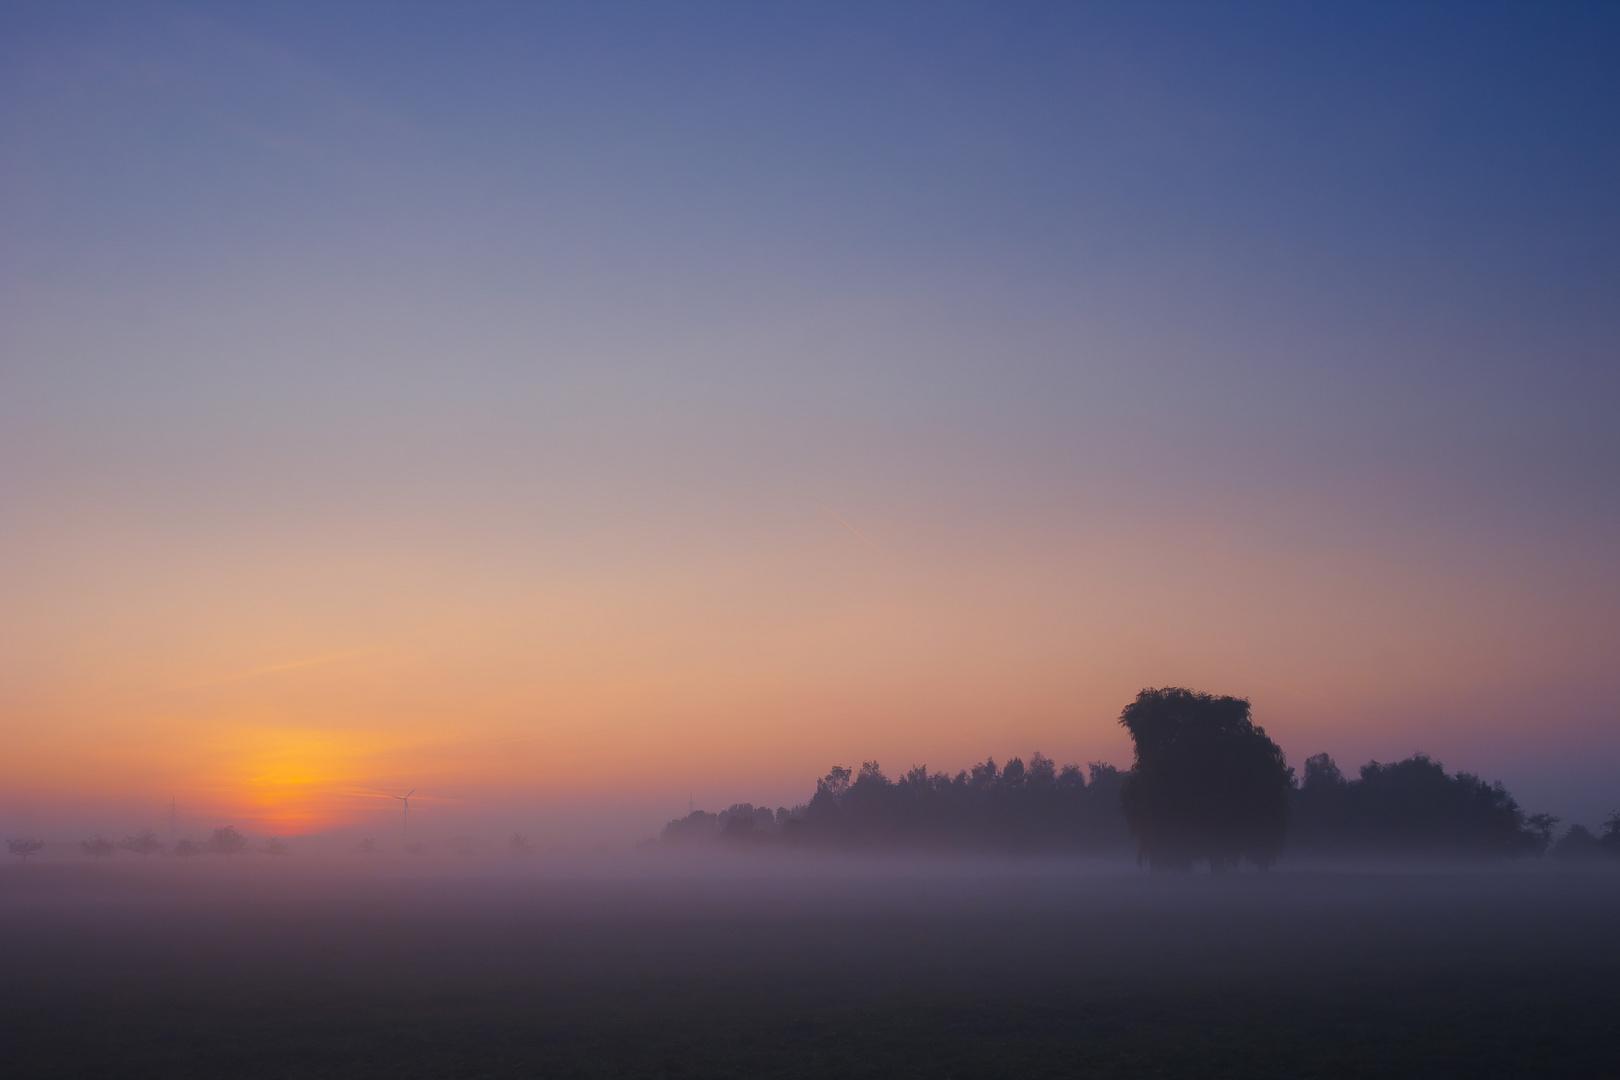 Kurz nach Sonnenuntergang